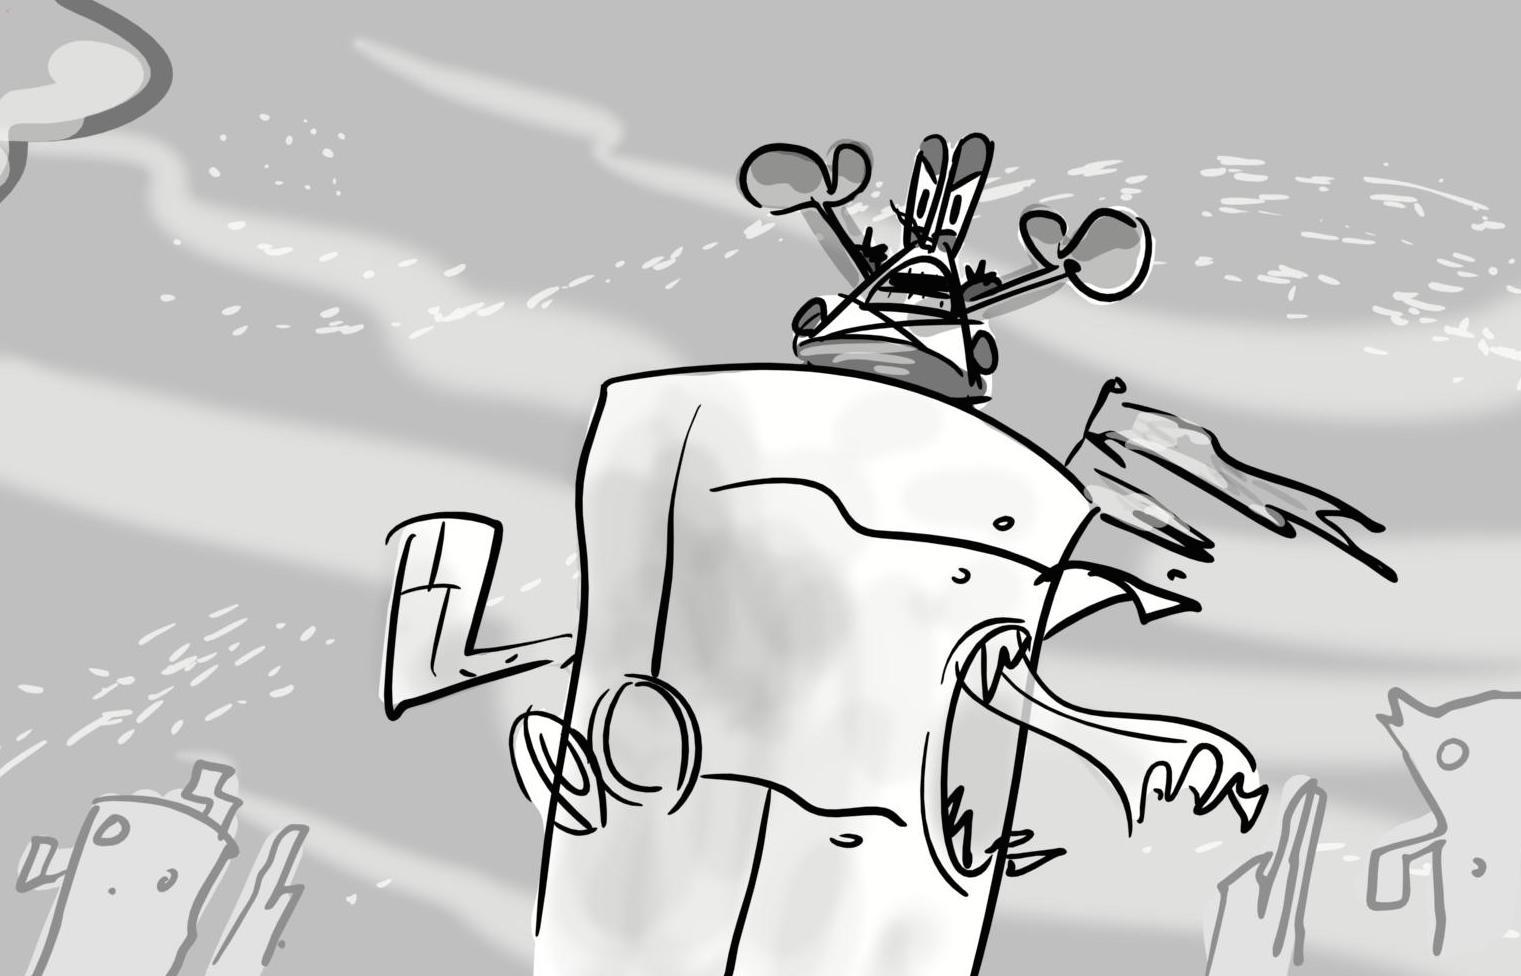 cartoon snap spongebob movie 2 some of my storyboard and